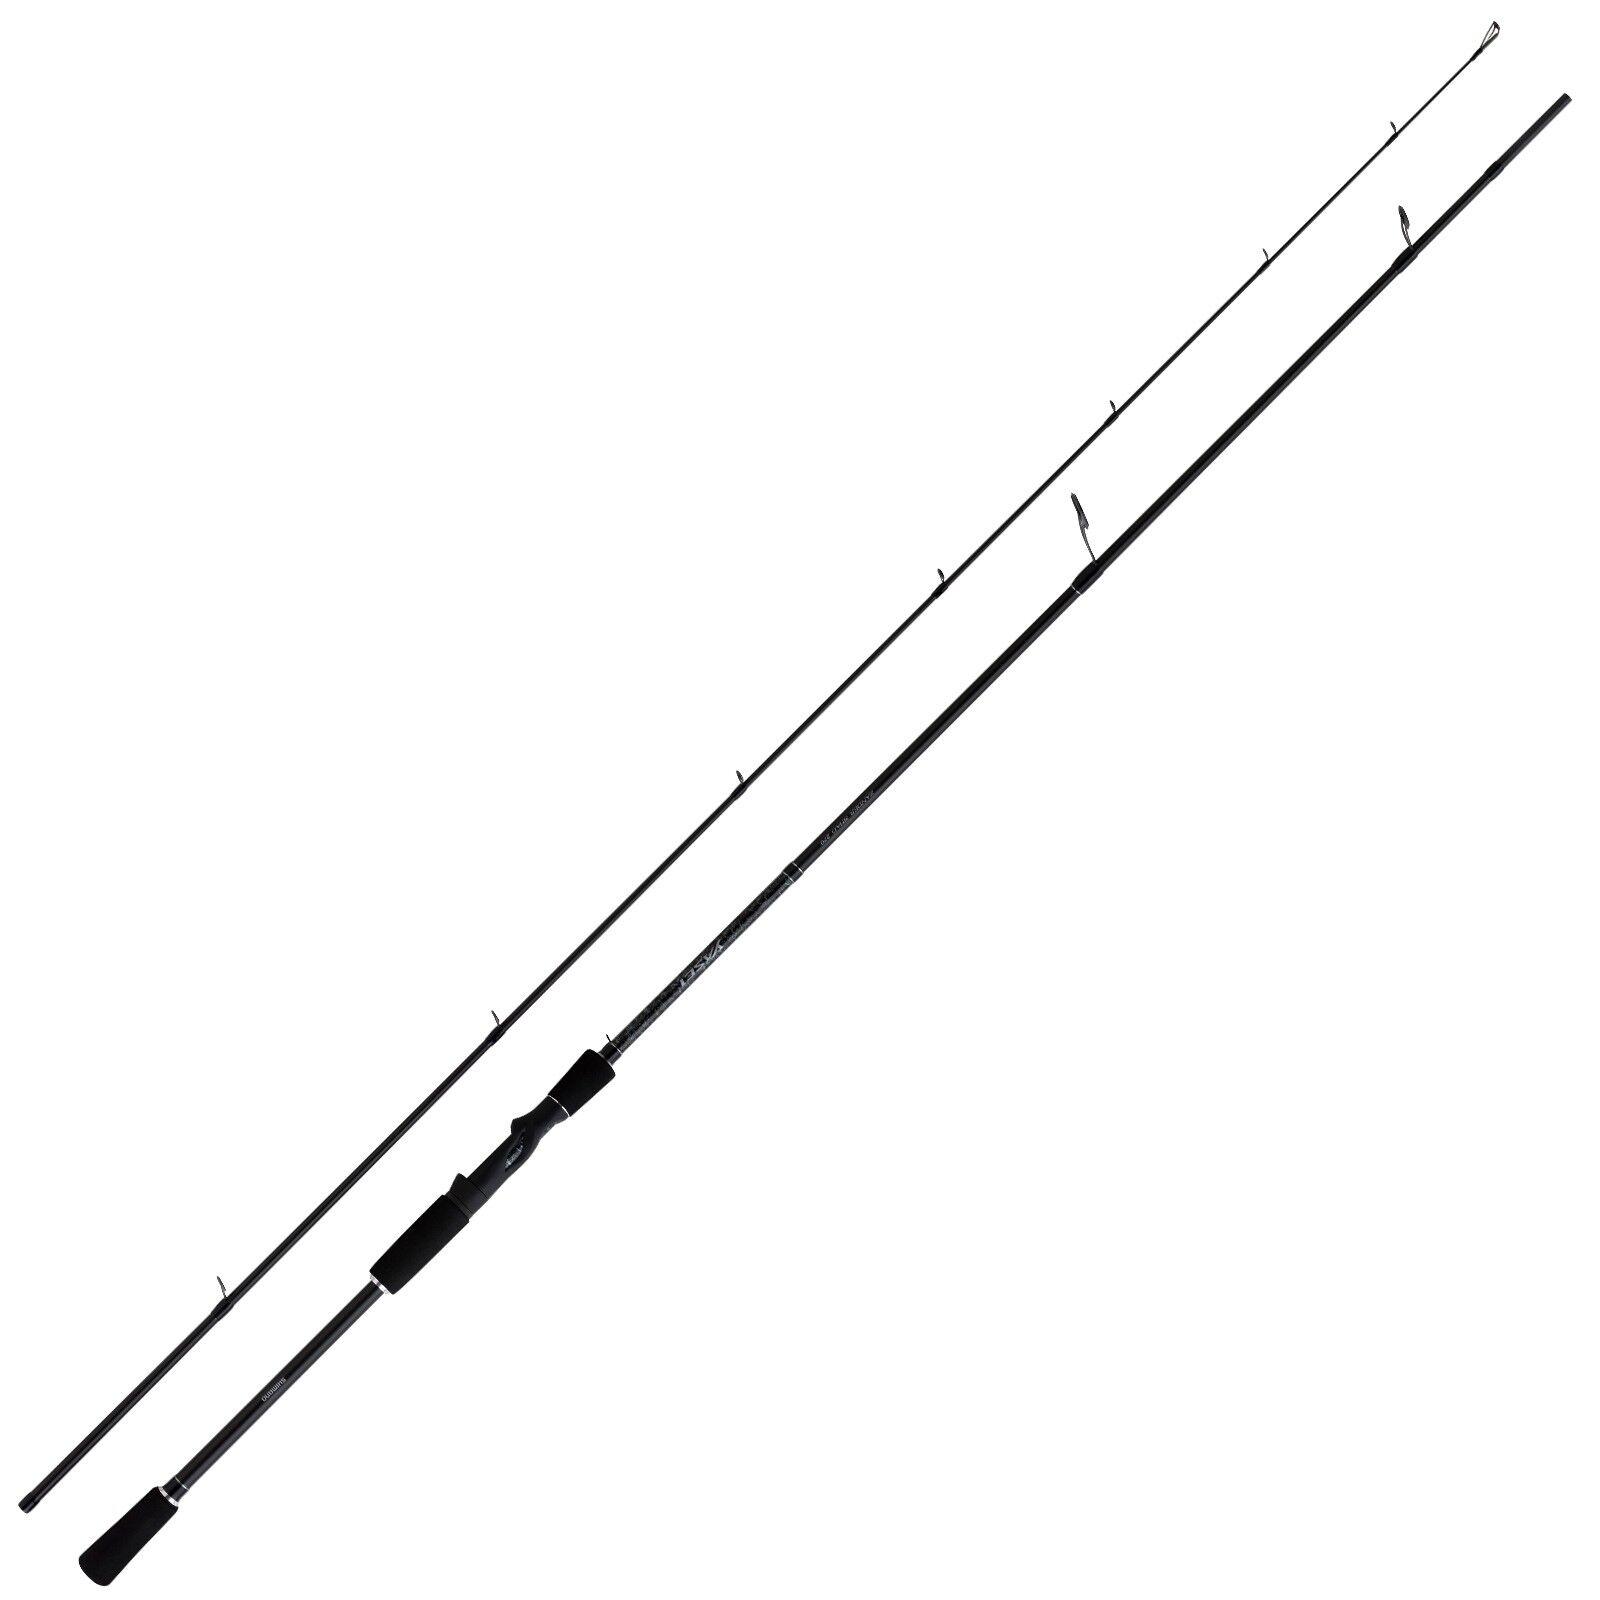 Shimano Angelrute – Yasei Zander Shad Spinning 270H 2,70m 24-56g